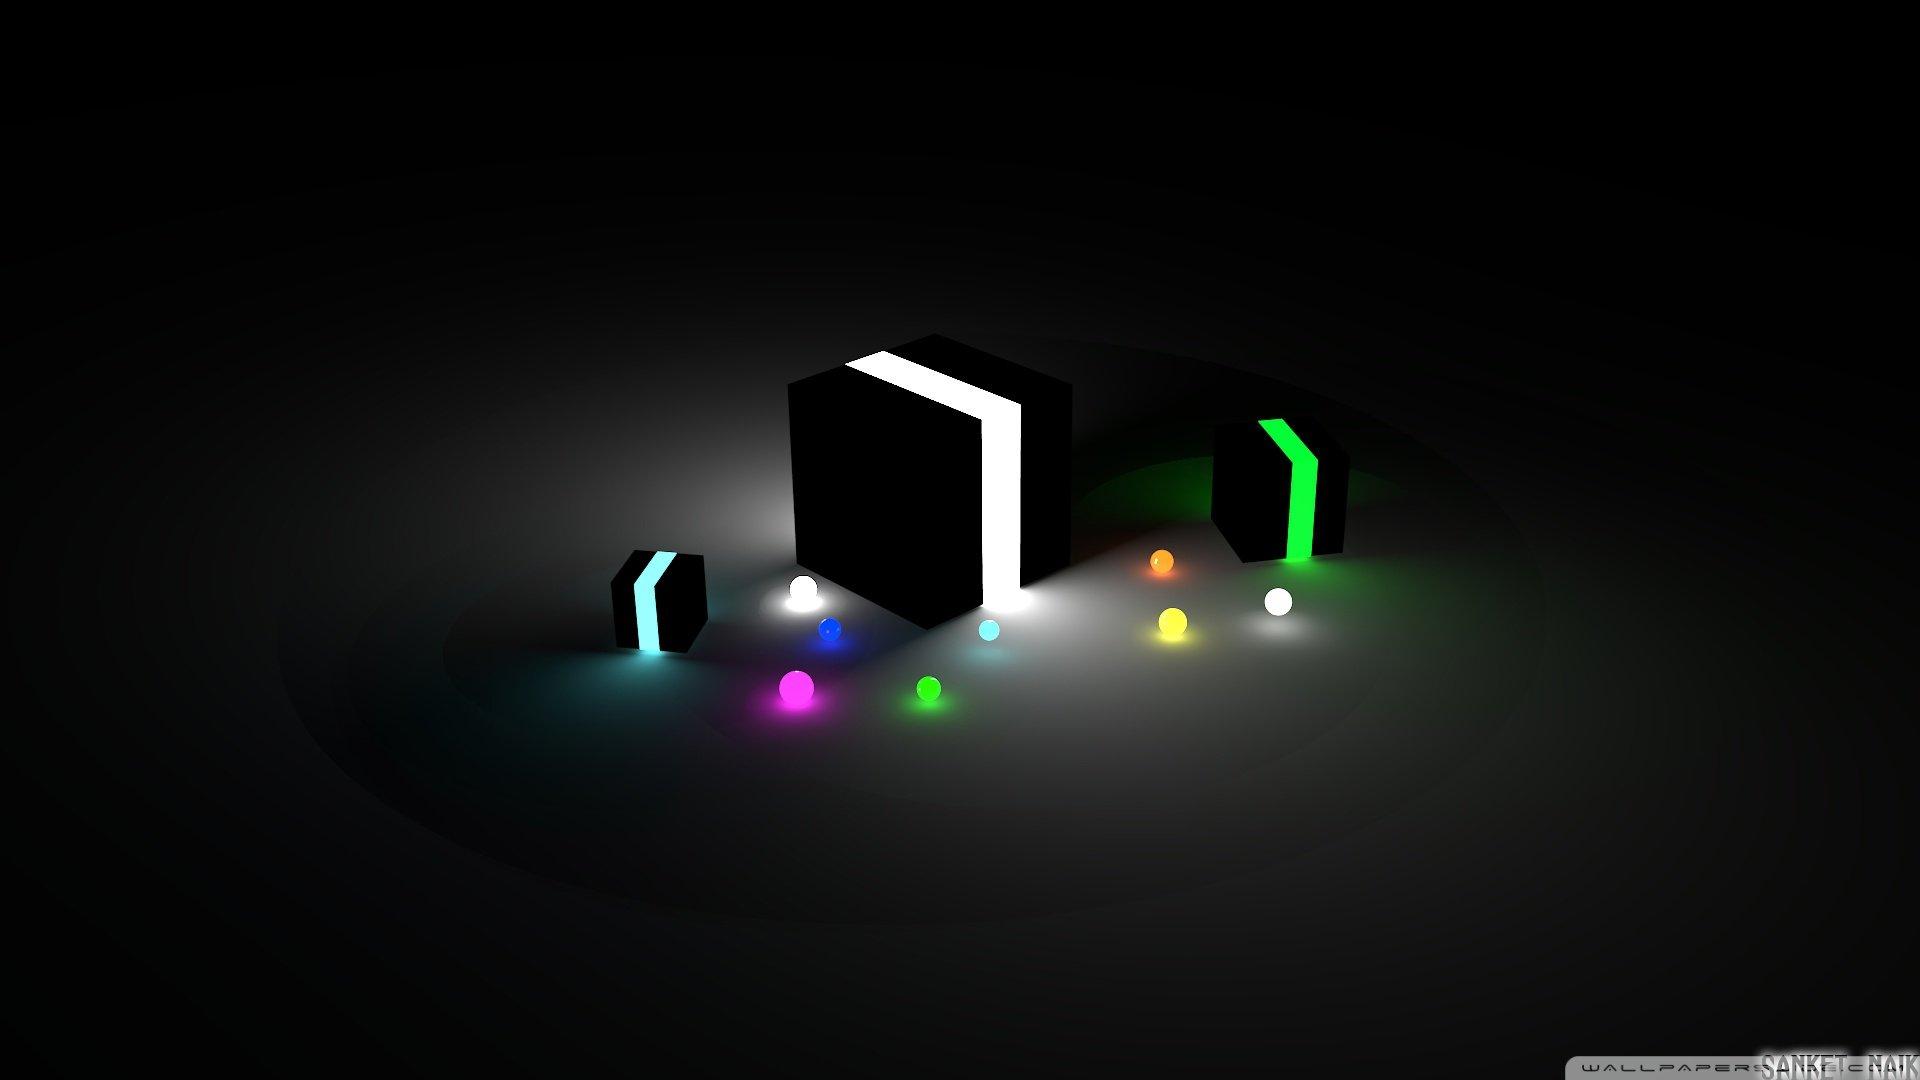 Glow cubes-wallpaper-1920x1080 wallpaper | 1920x1080 ...